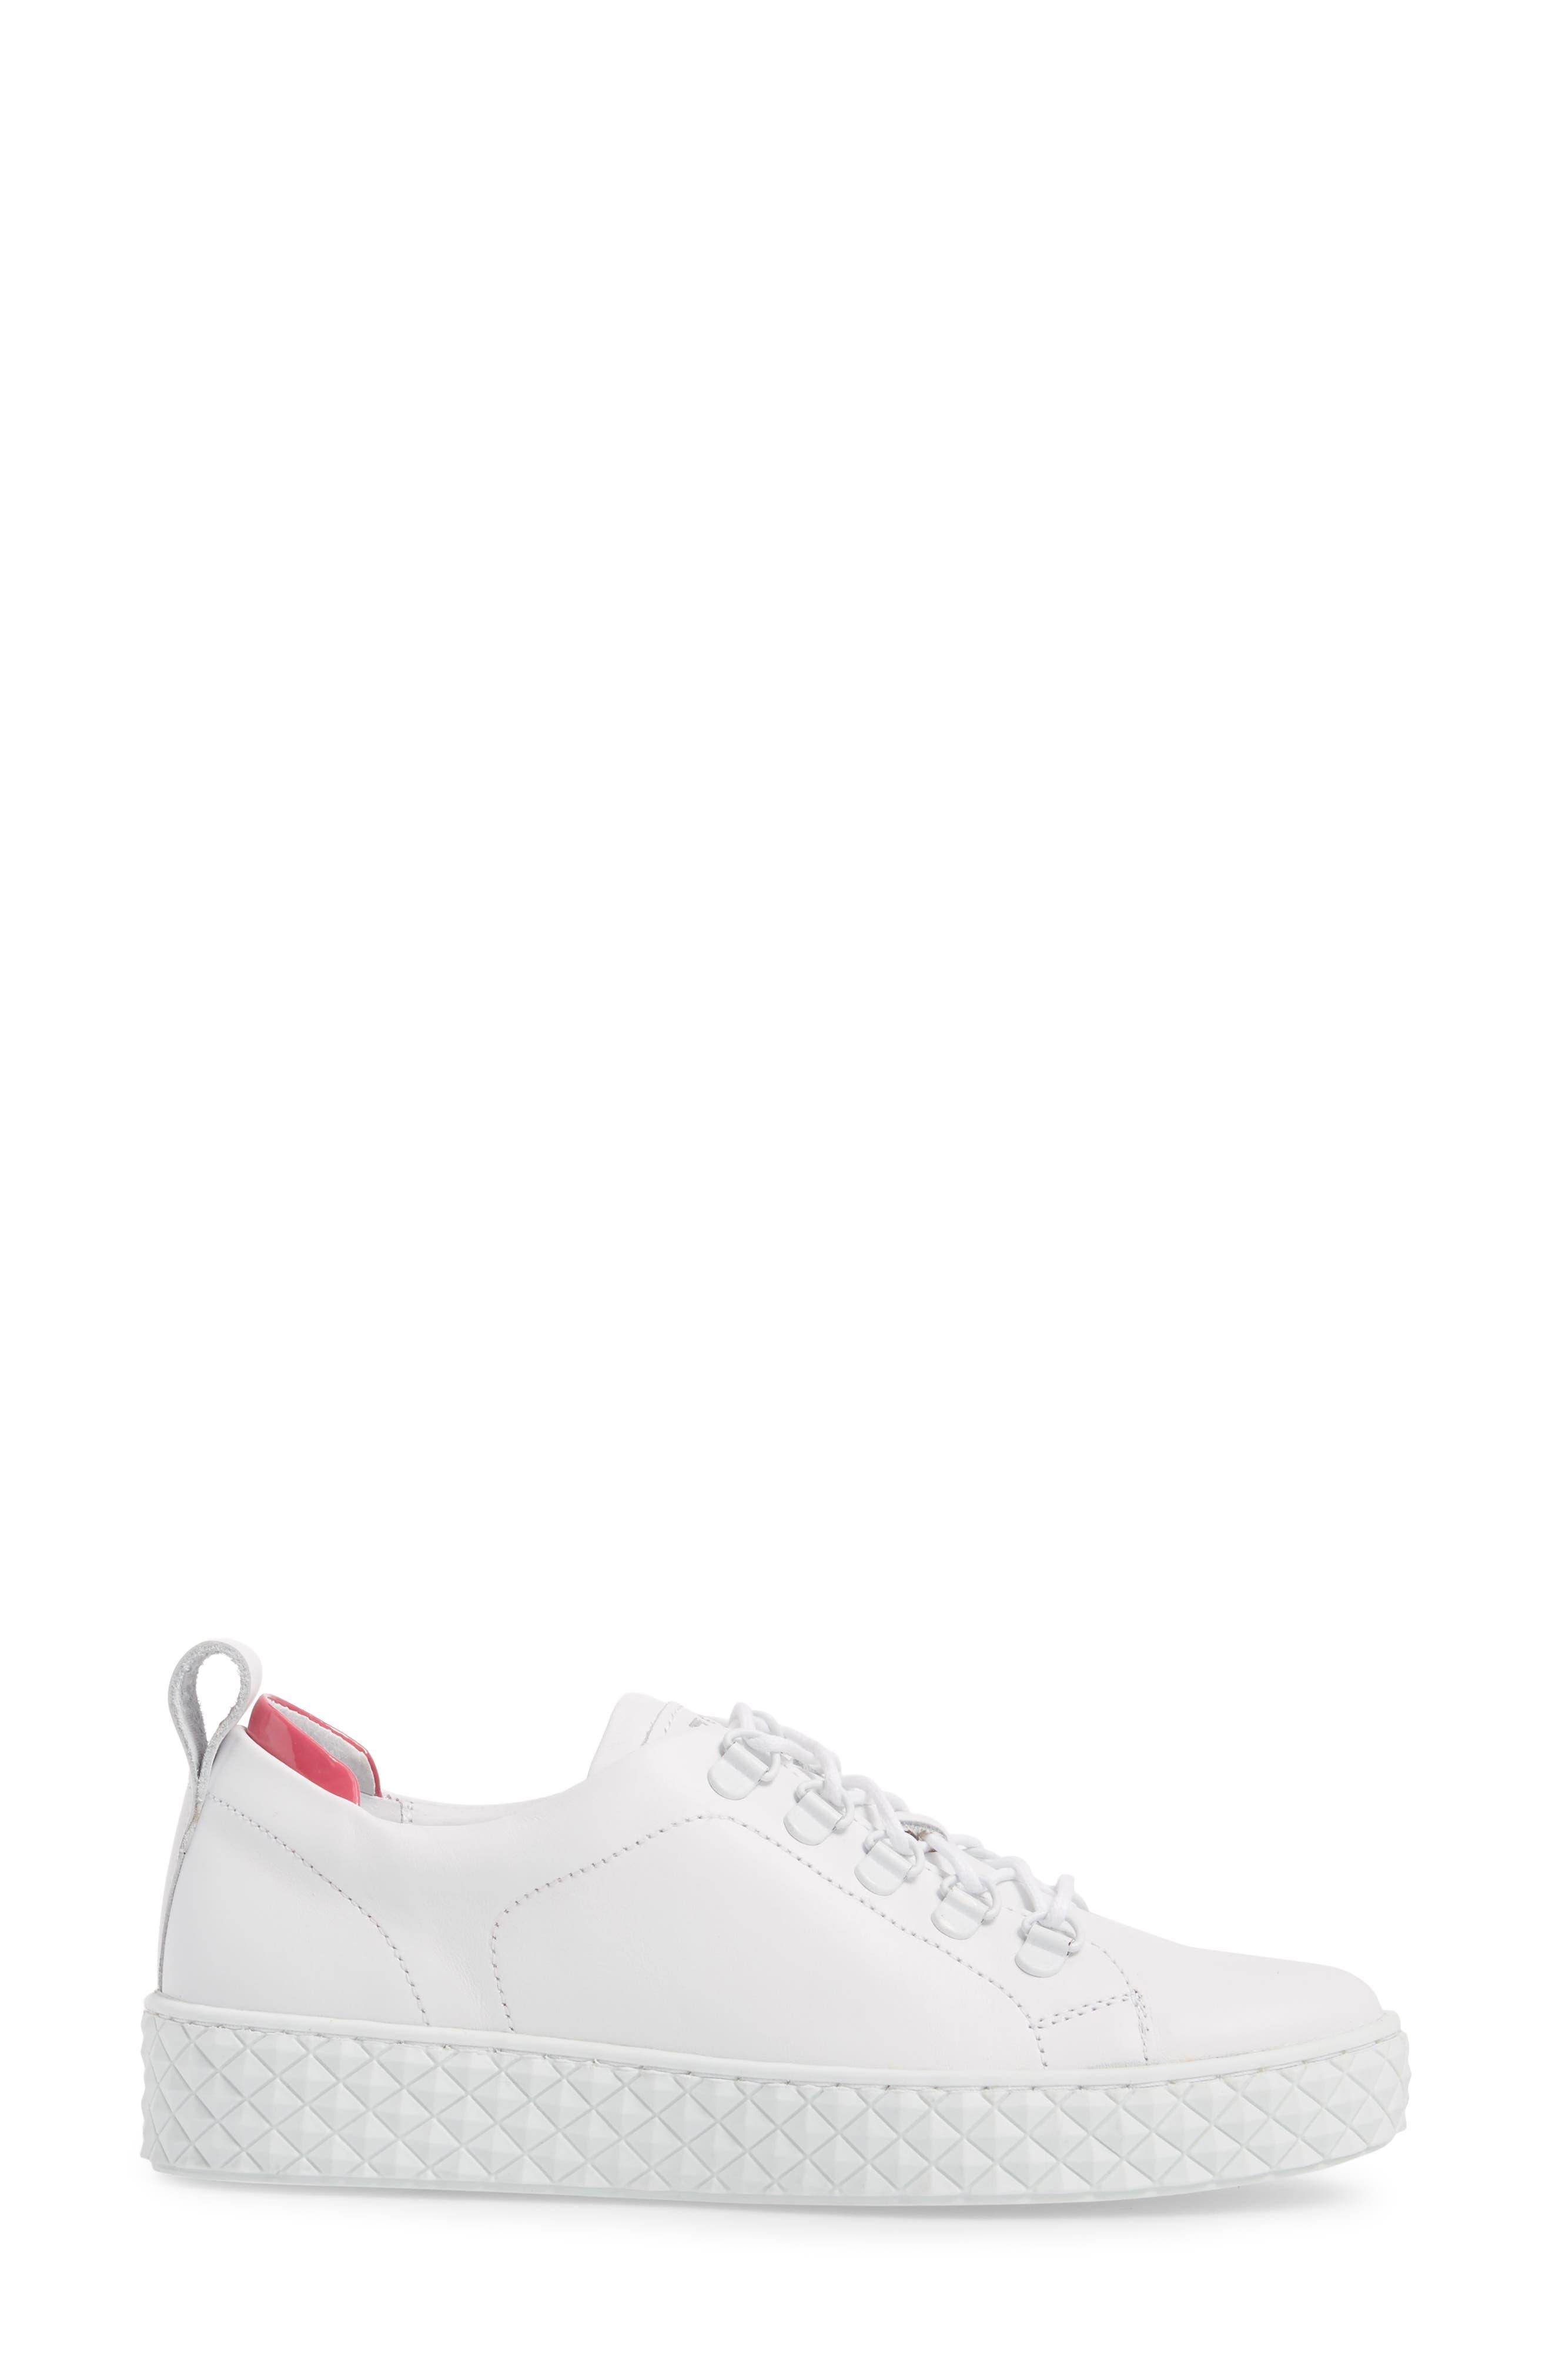 Sol Sneaker,                             Alternate thumbnail 3, color,                             Optic White/ Fuchsia Leather